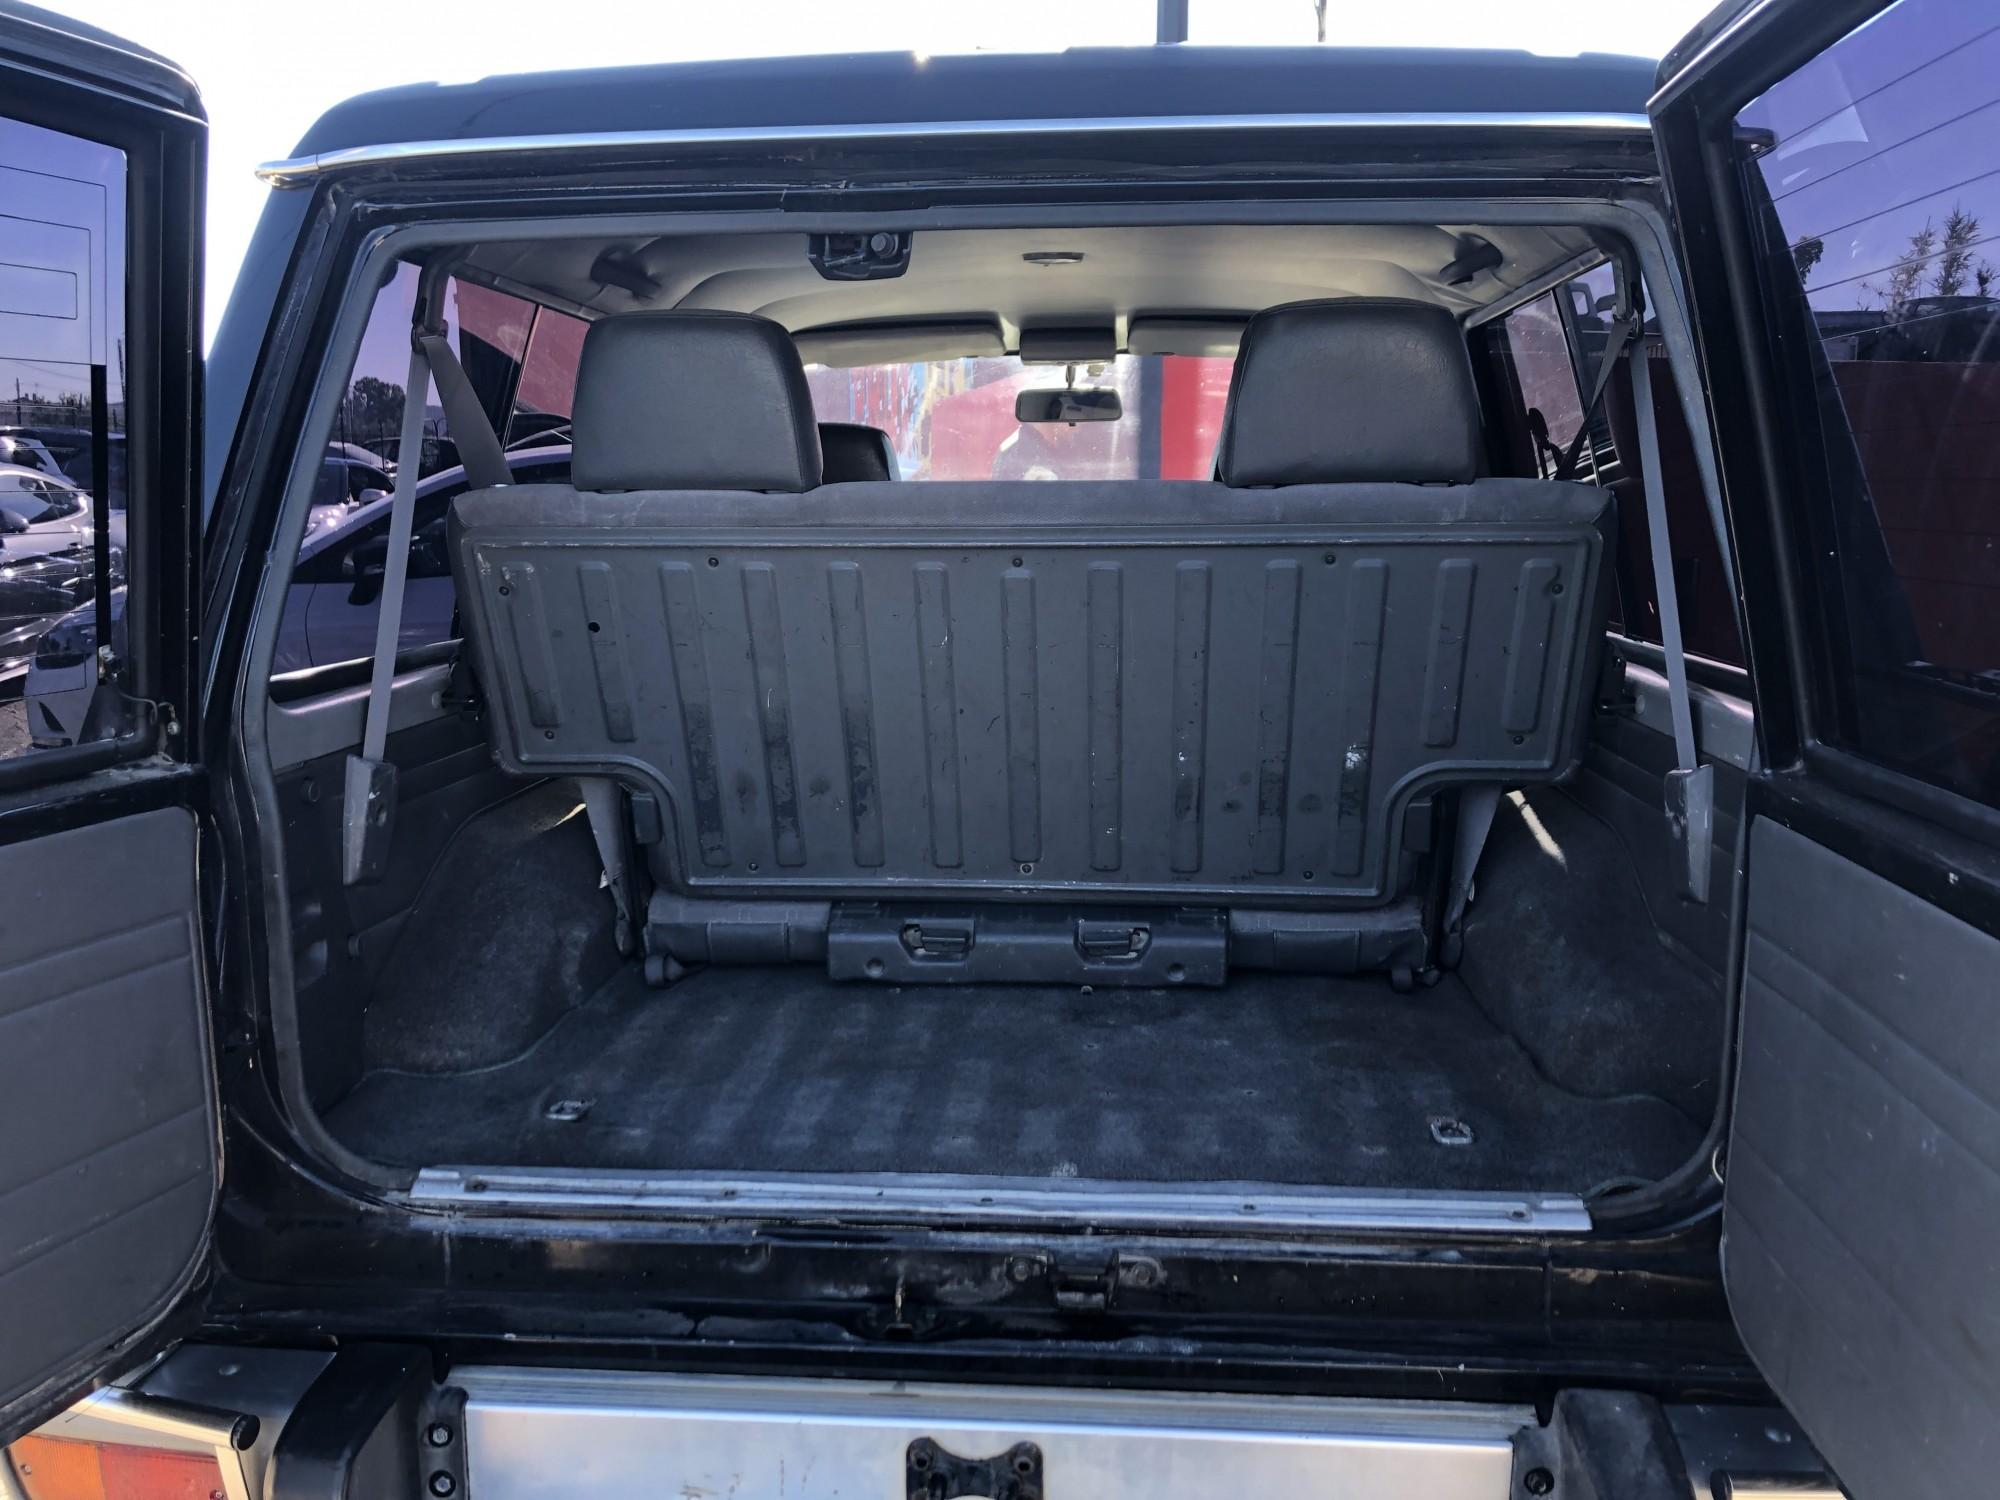 4x4 Nissan Patrol Turbo Y60 2 8 Td 115 Ch Court De 1994 4x4 Occasion Pro Fun 4x4